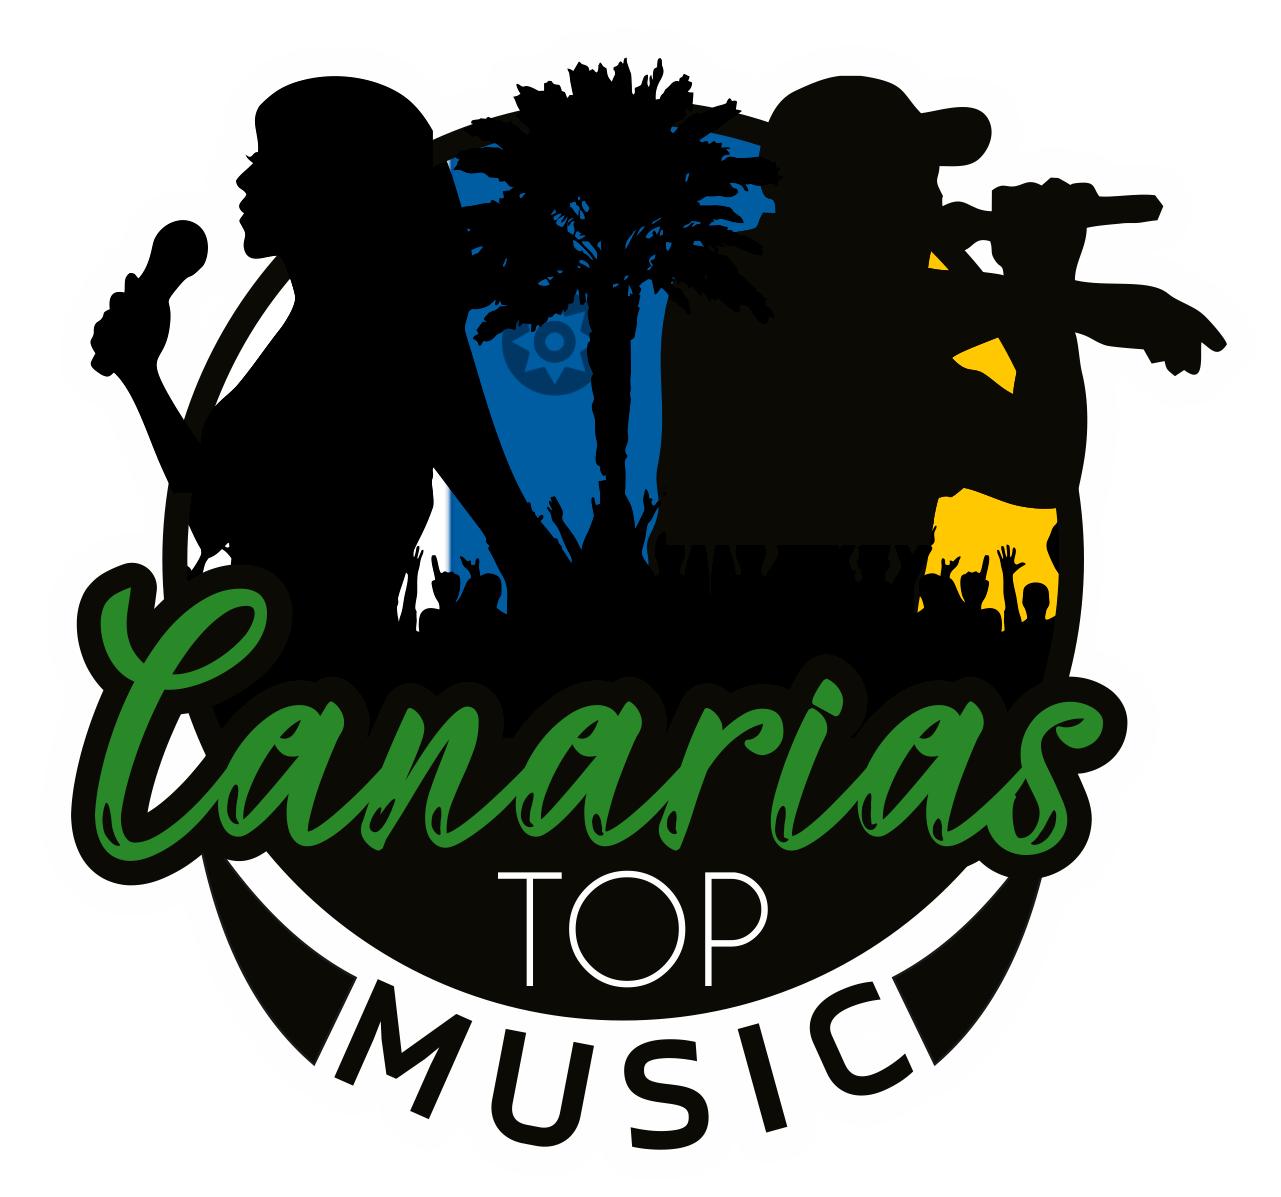 CANARIAS TOP MUSIC LOGO recortado